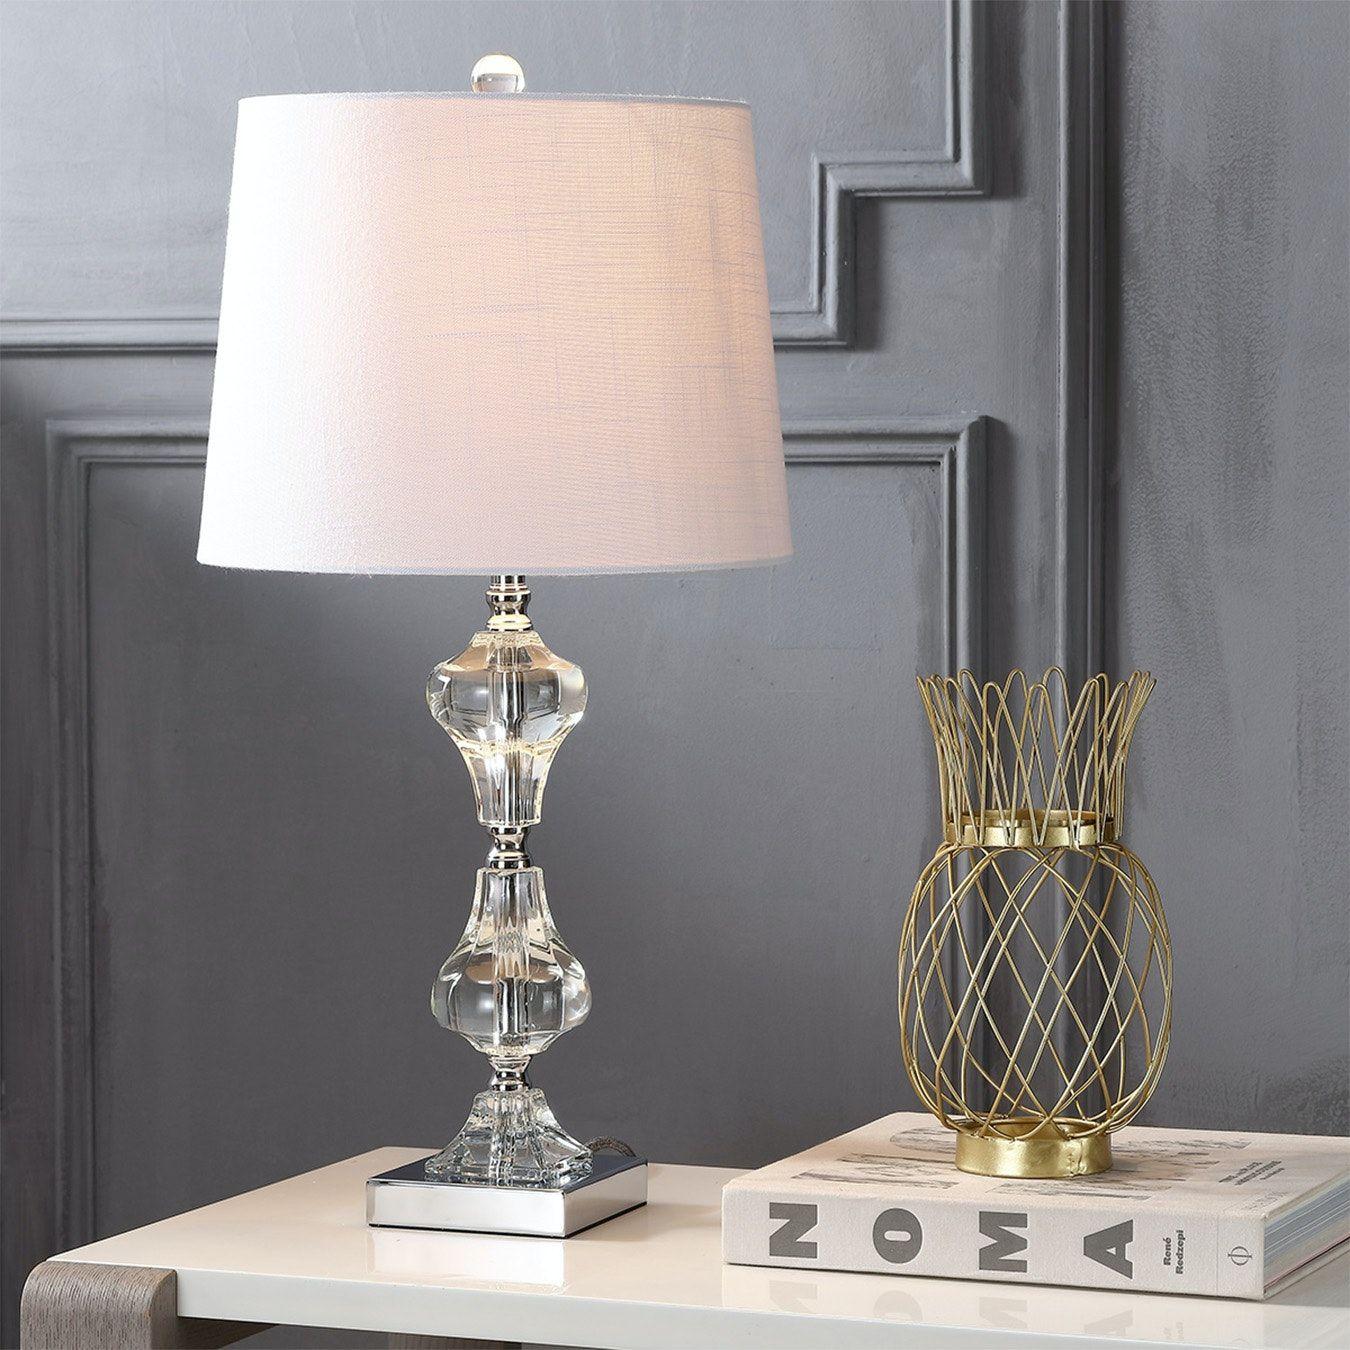 Chloe Led Table Lamp Clear Crystal In 2021 Crystal Table Lamps Table Lamp Led Table Lamp